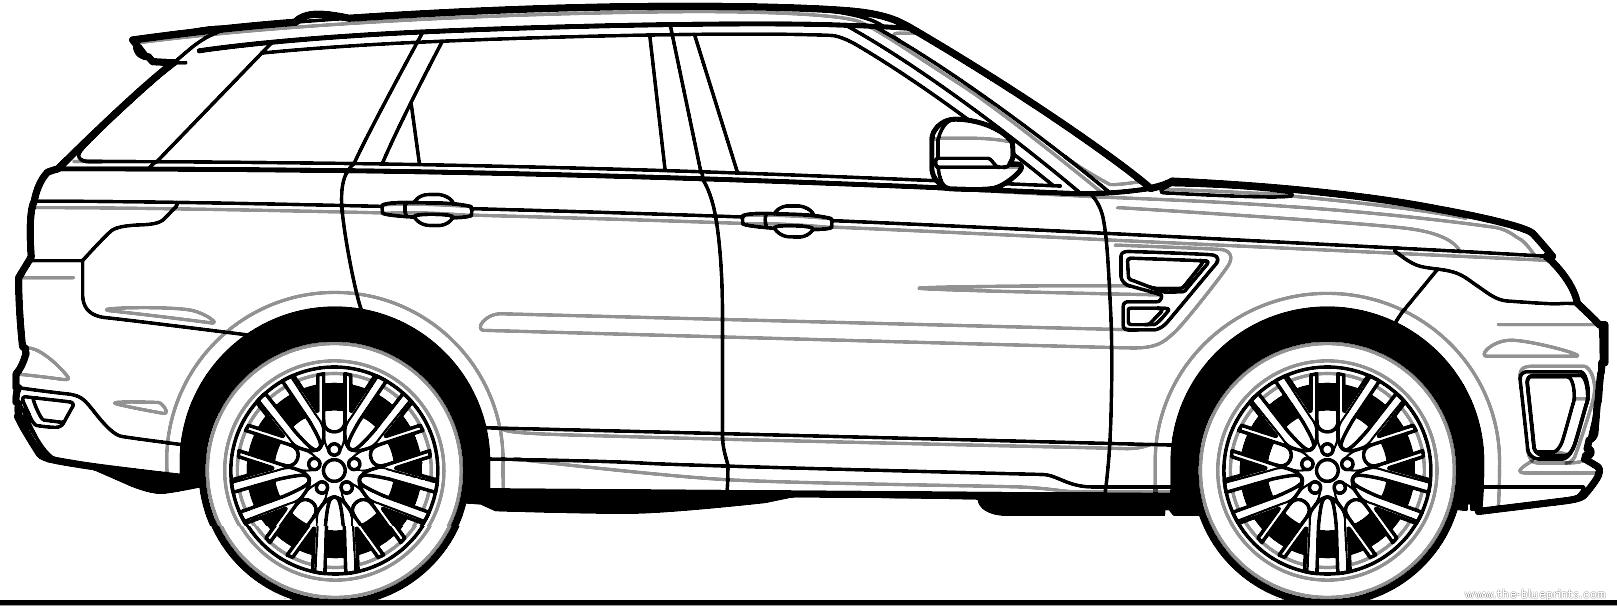 Blueprints > Cars > Land Rover > Land Rover Range Rover